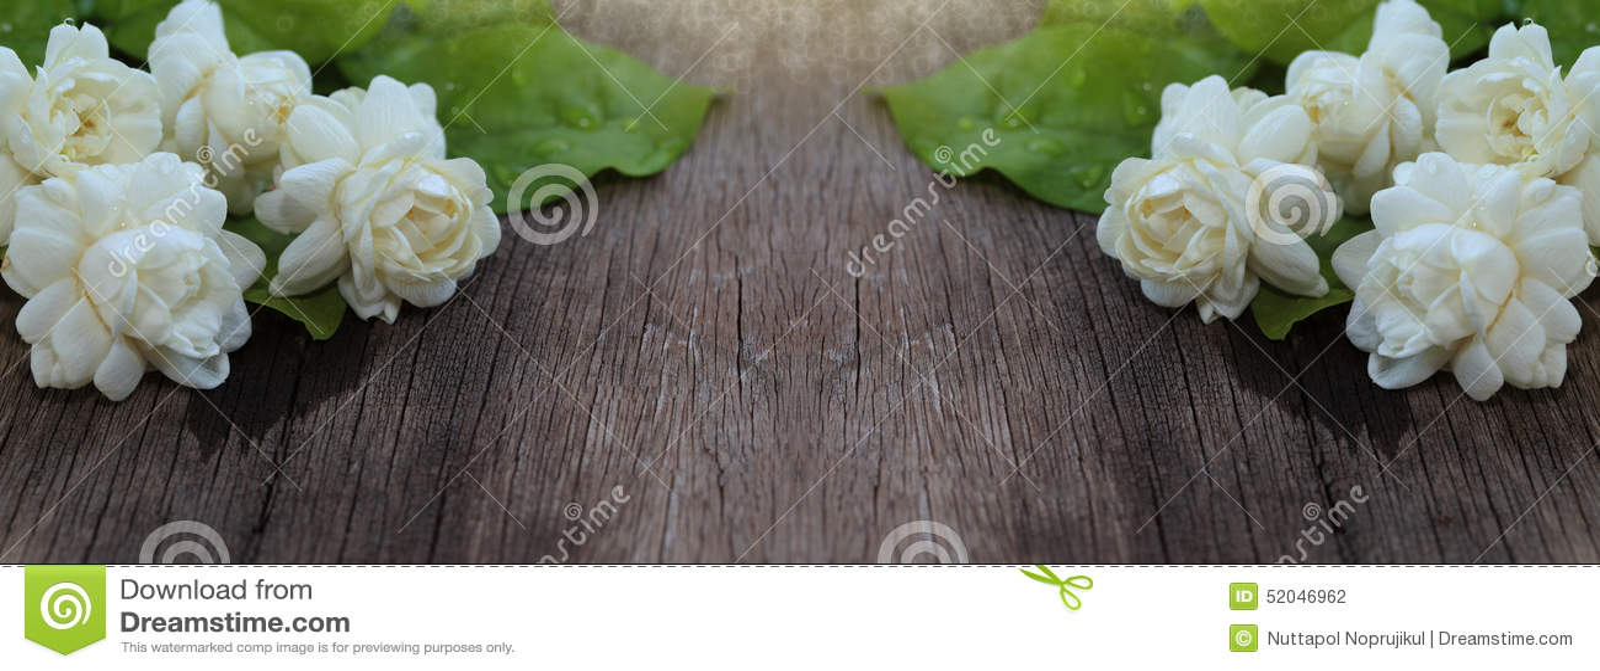 Тропический цветок жасмина на древесине Цветки и листья жасмина на br